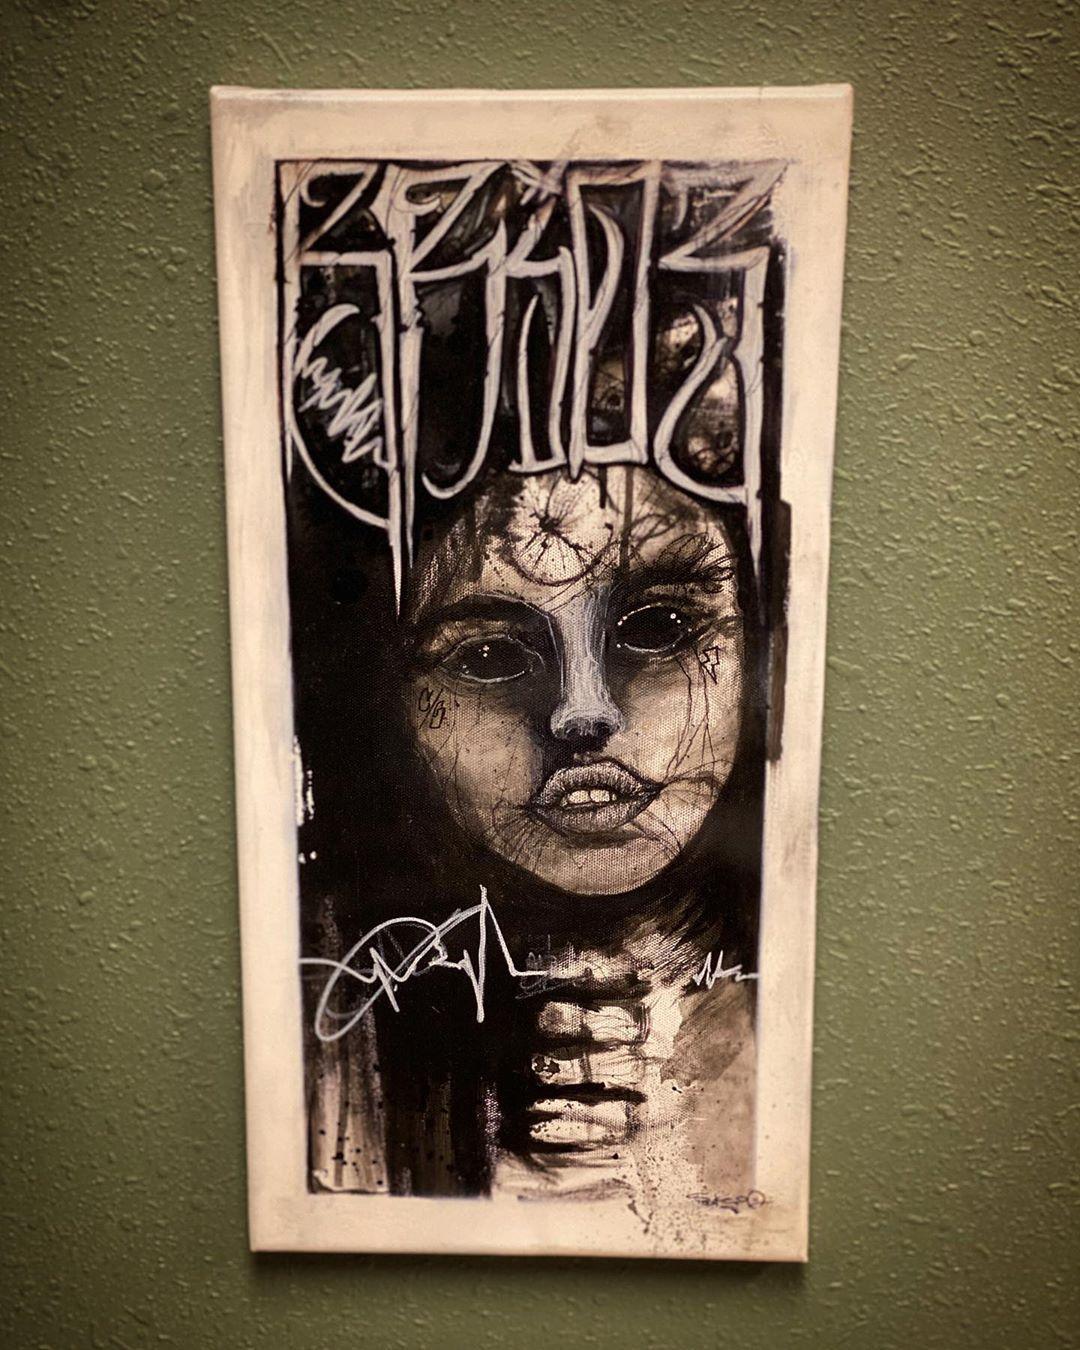 #thebride #brideoffrankenstein 16x40 #acrylic on #canvas #mixedmedia original.  FOR SALE or Print on Canvas  DM or email if interested:  Coldave31@gmail.com • • •  @joeyspooks @cold_ave @natata2 @electricartkenosha #frankenstein #themonster #drfrankenstein #life #itsalive #darkart #paint #painting #art #artist #chicago #watercolor #graffiti #lettering #tattoo #tattooart #tattooartist #dark #black #ink #inked #blackandgrey #realism #coldave #joeyspooks